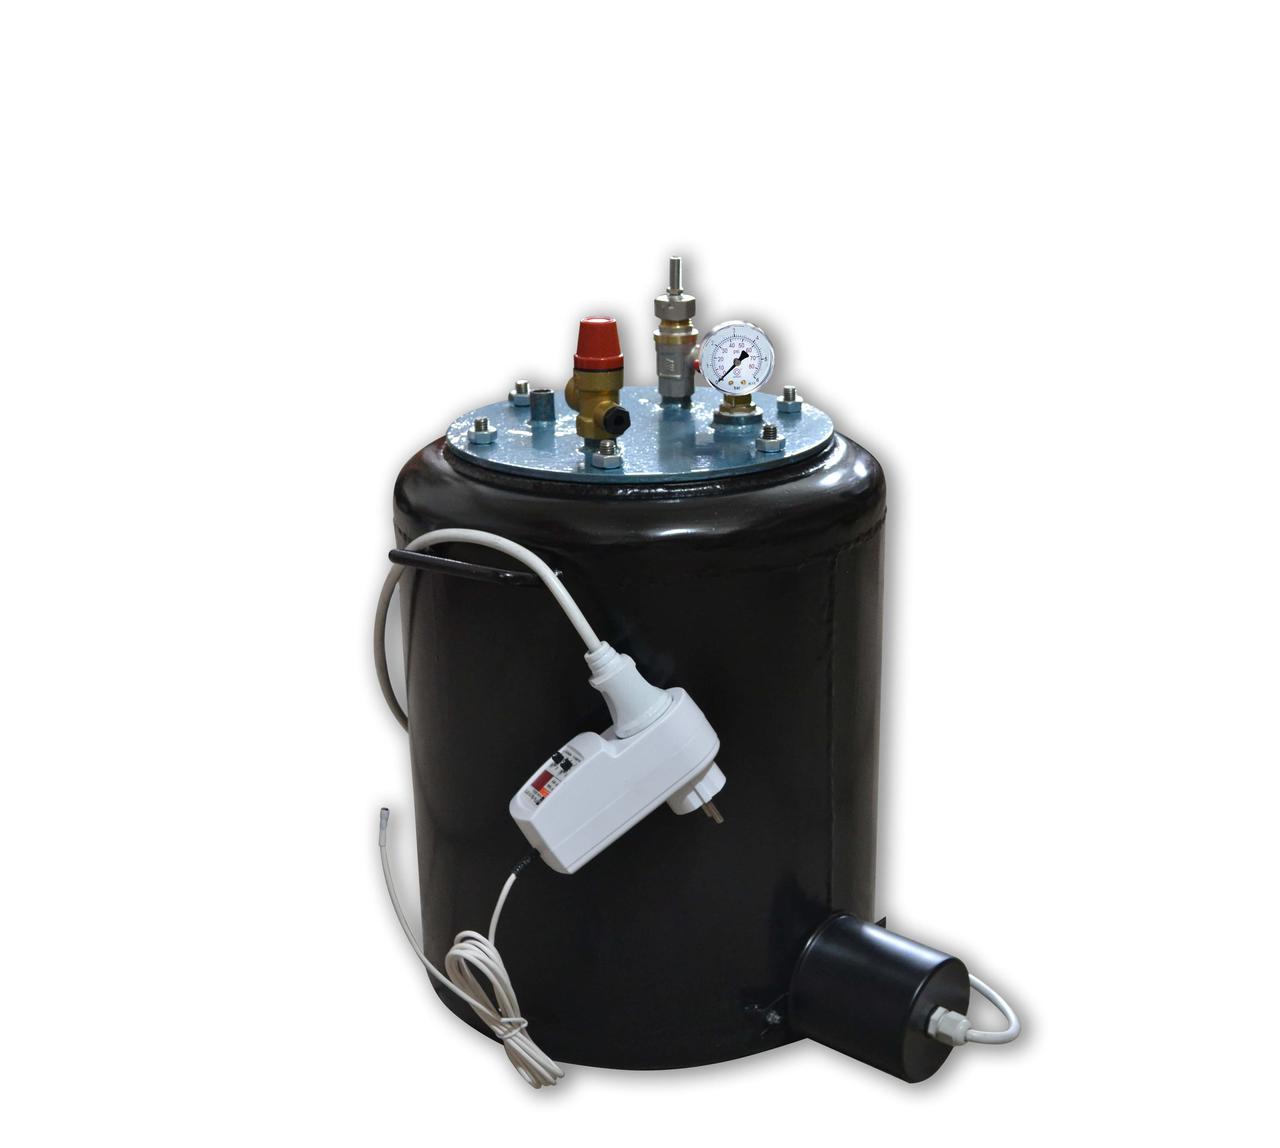 Автоклав электрический УТех-16 electro (1л-7шт, 0,5л-16шт)